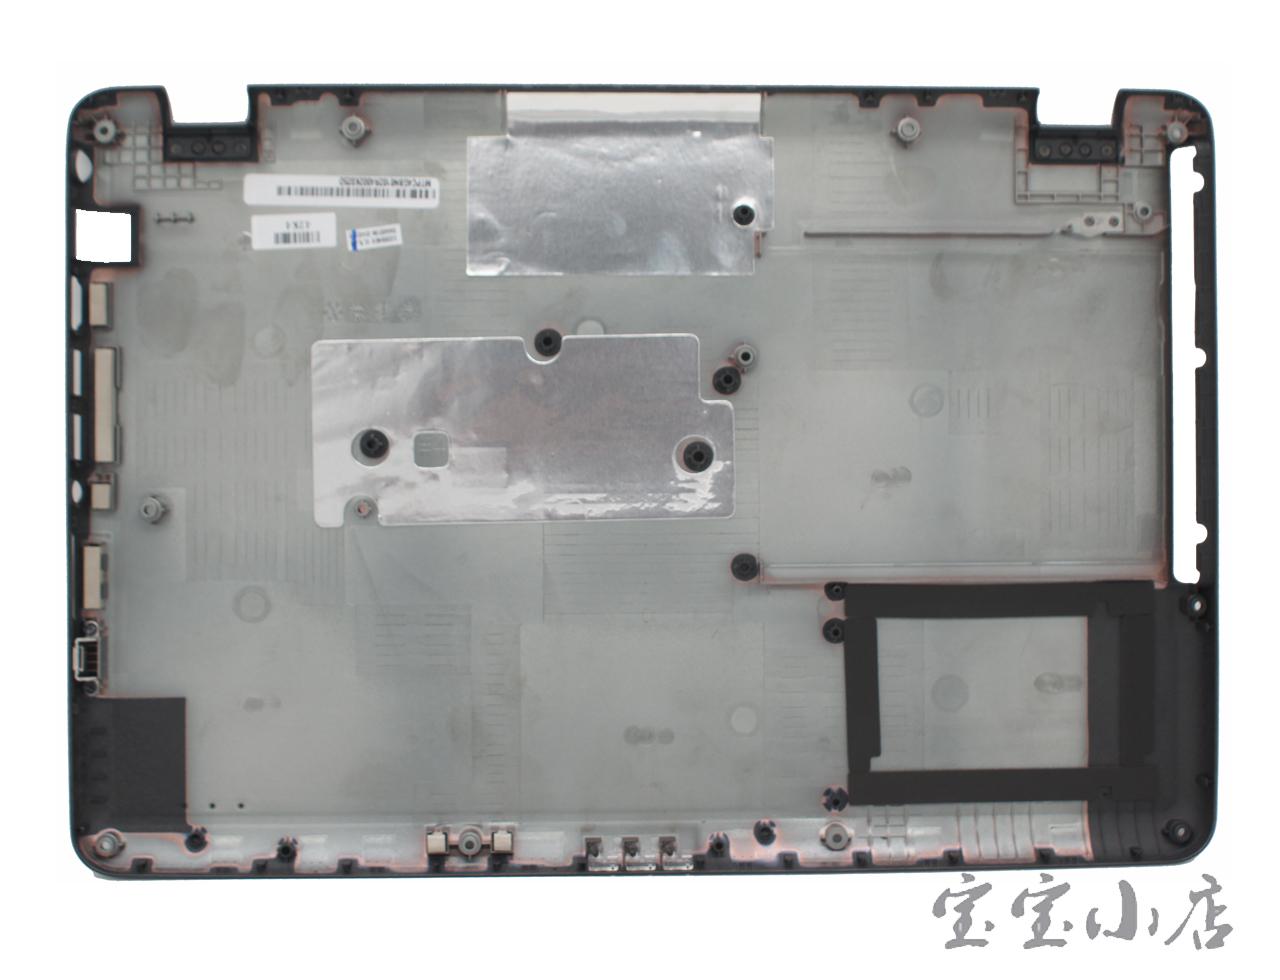 全新 索尼Sony Vaio SVF14A Series 3JGD5BHN010 14.0